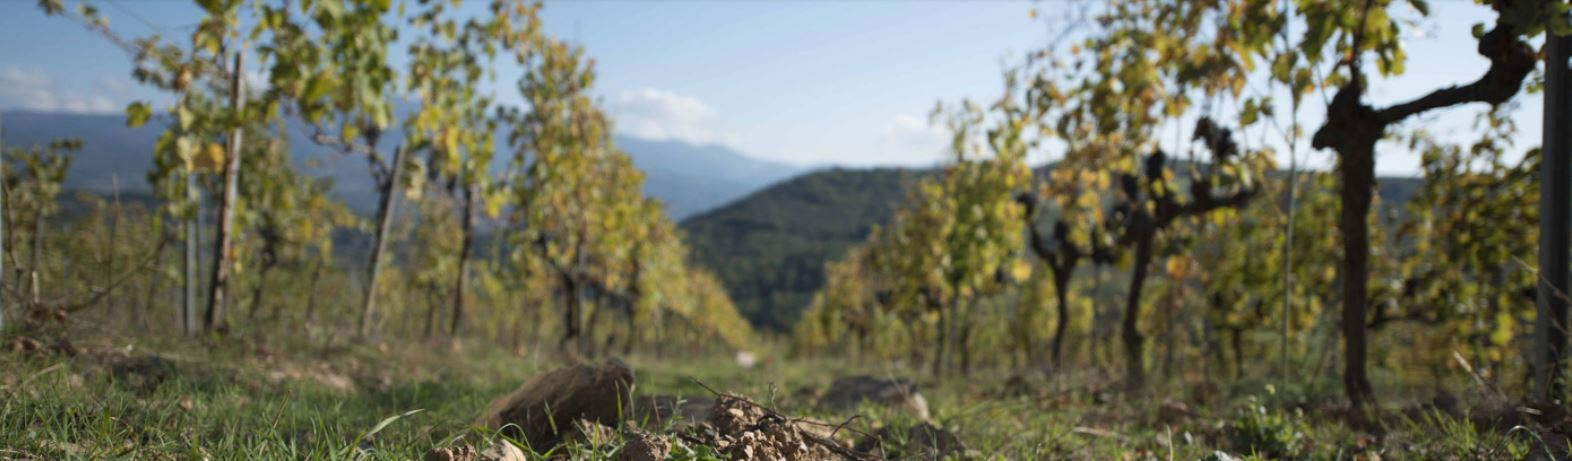 rebst-cke-toskana-montalcino